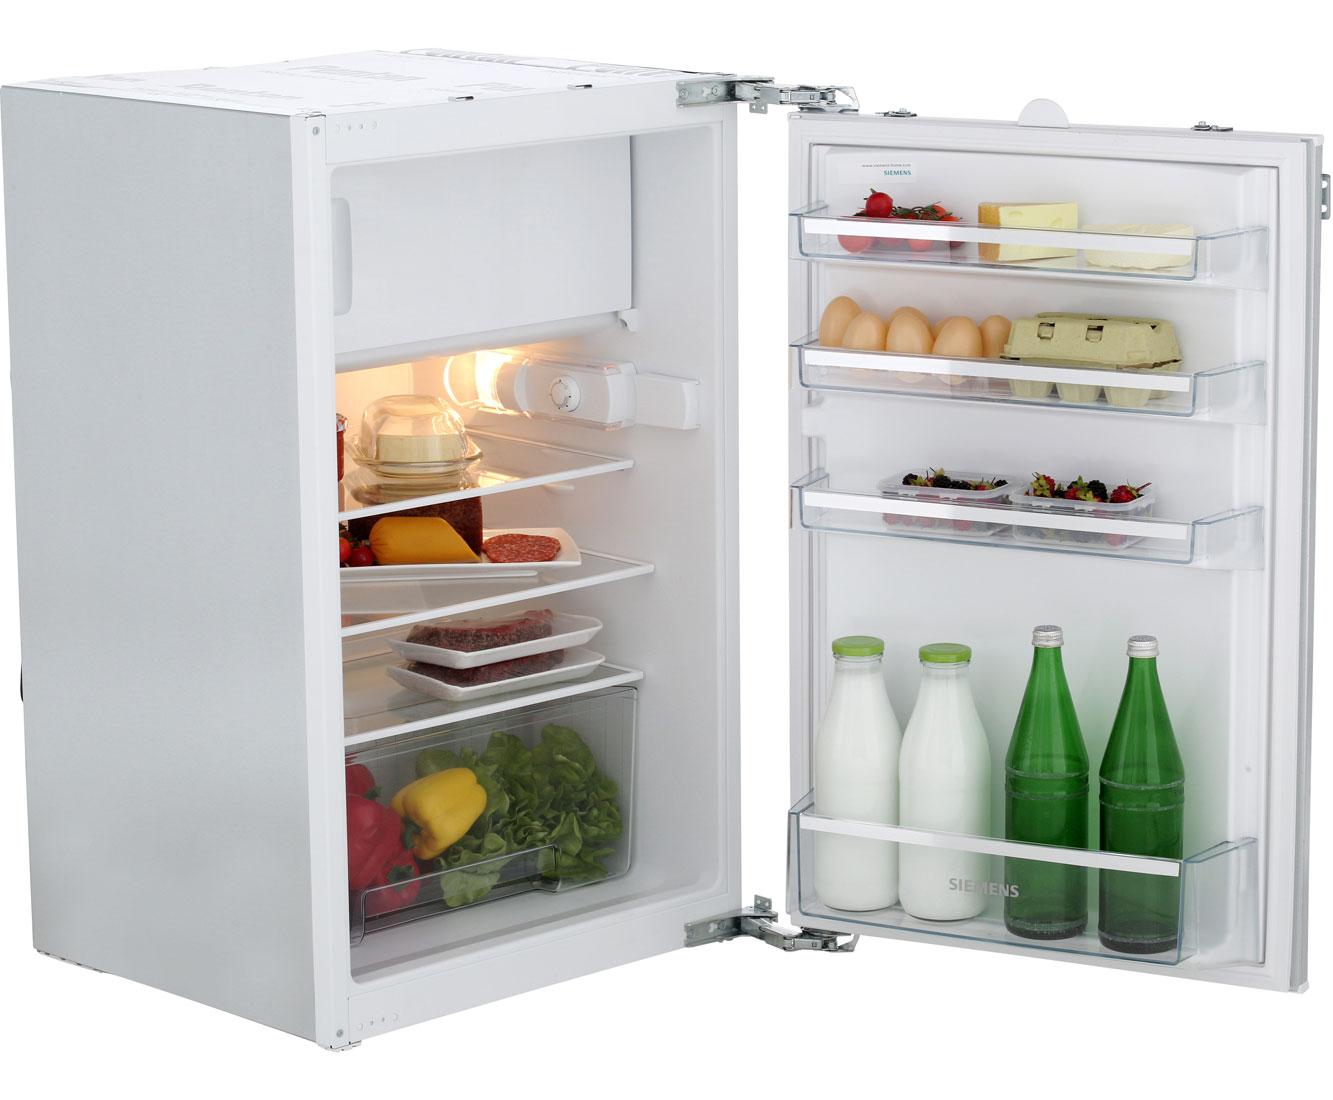 Kühlschrank Gebraucht : Kühlschrank gebraucht elmshorn sesselauflage poppi in blau